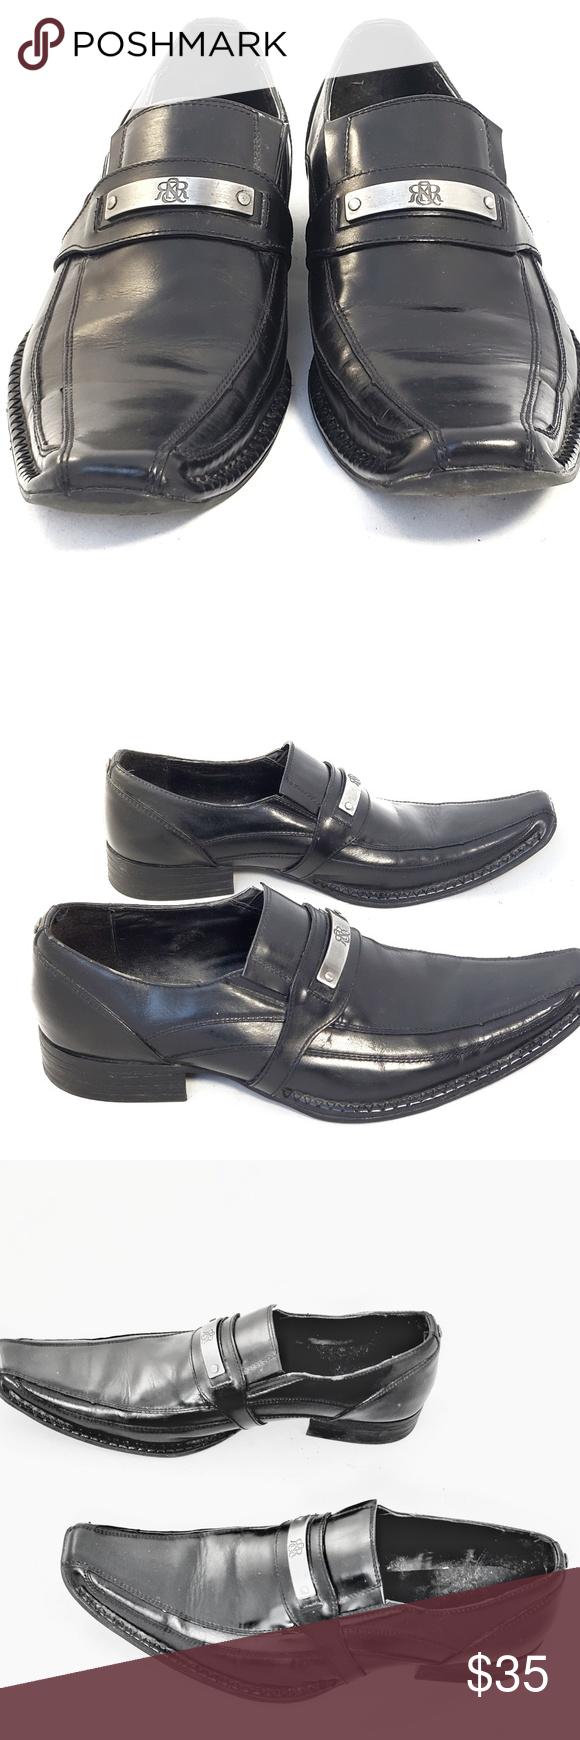 Rock Republic Men S Black Dress Shoes Mens Black Dress Shoes Black Dress Shoes Shoes [ 1740 x 580 Pixel ]